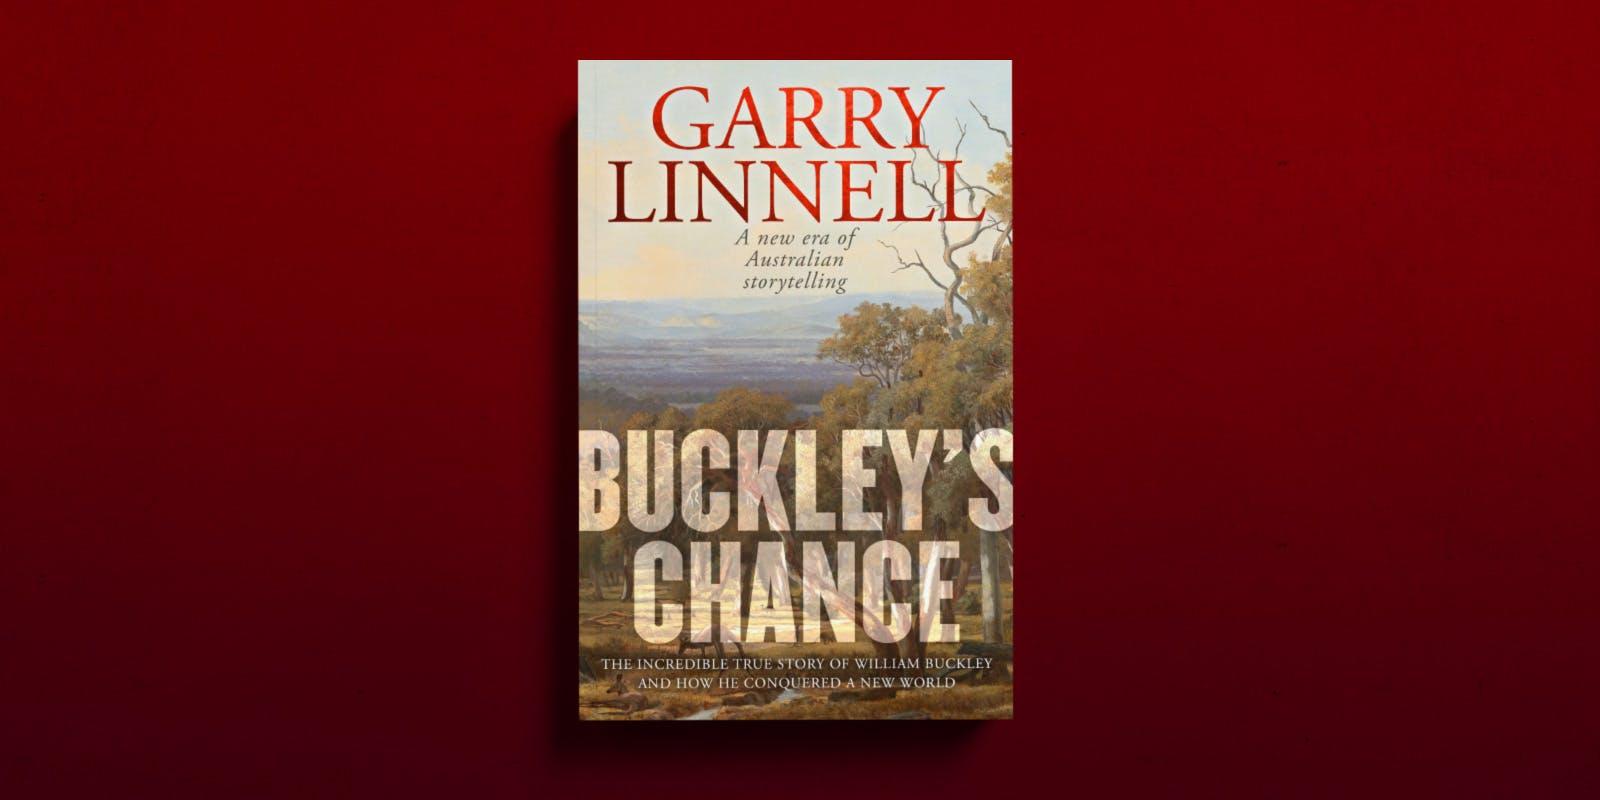 Walking with William Buckley